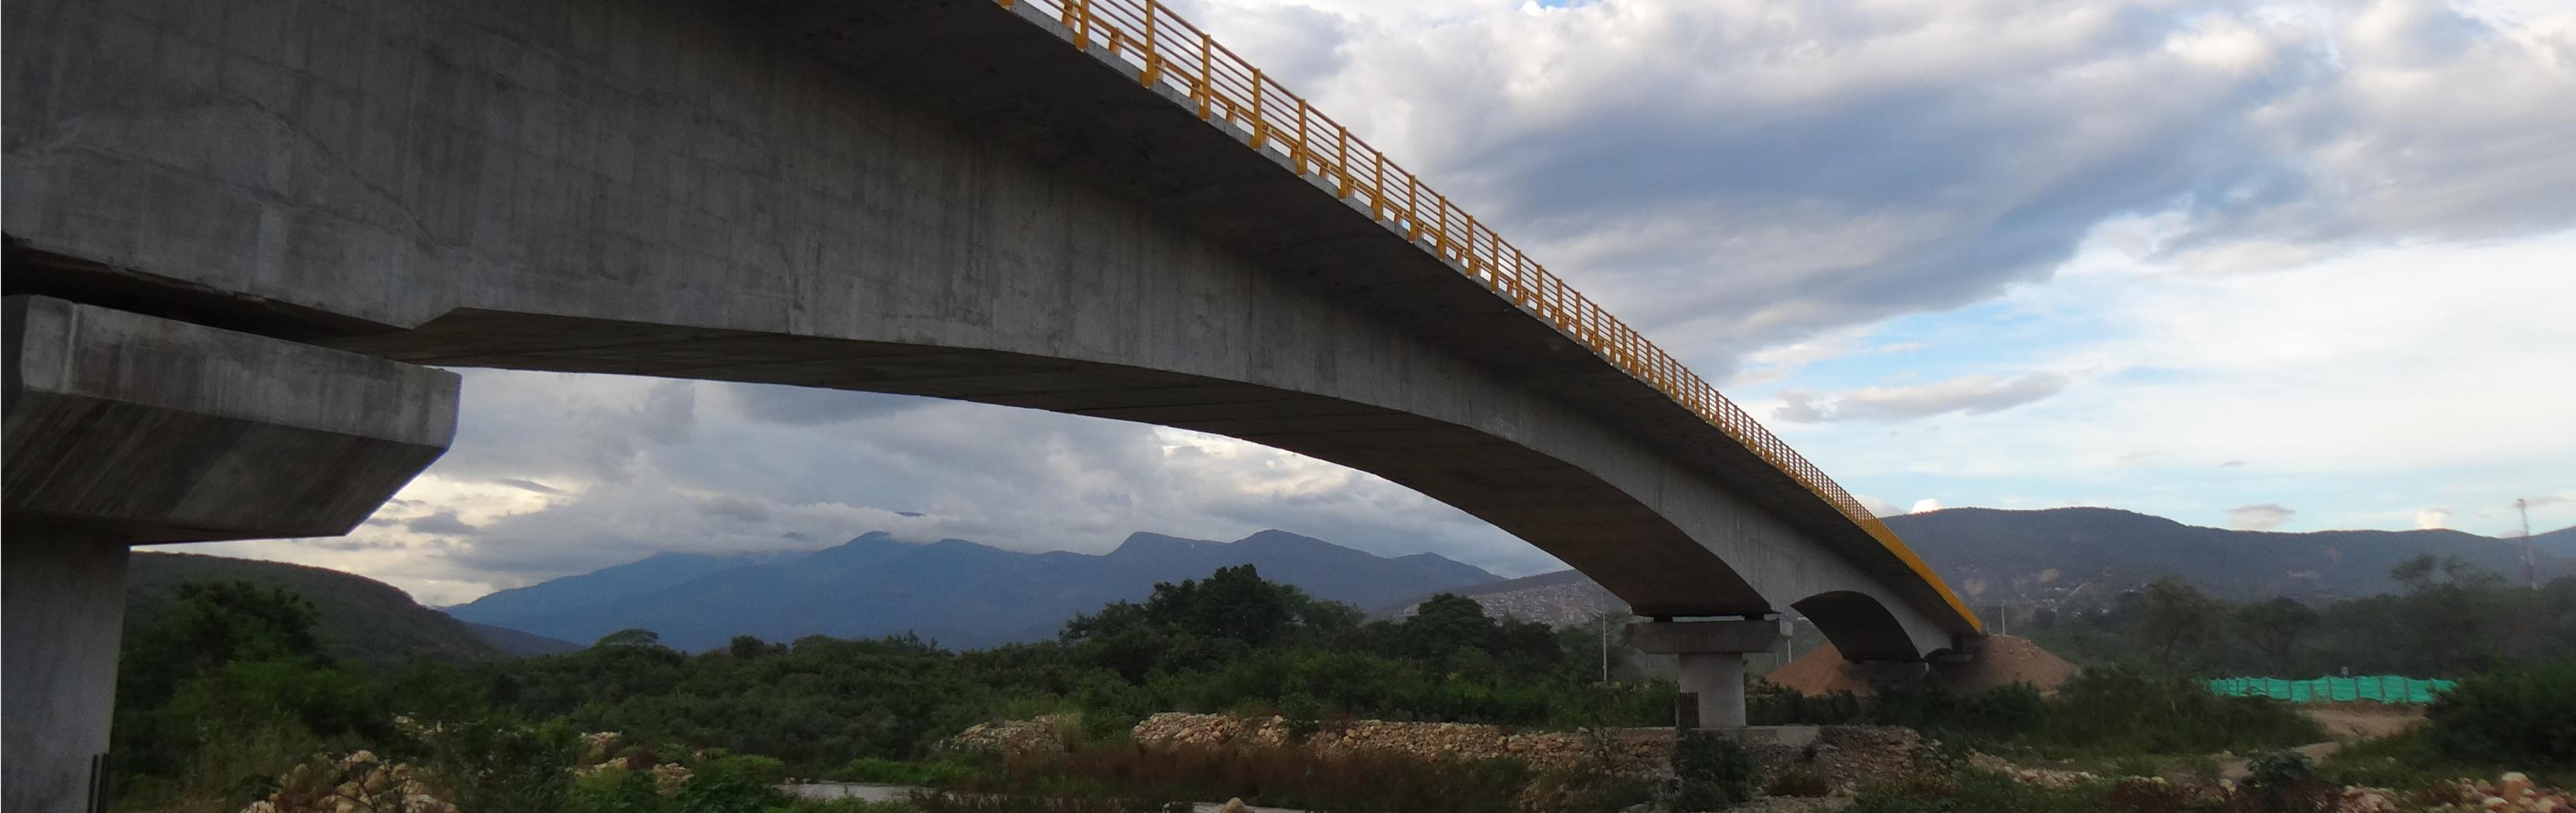 puente-pamplonita-3-1